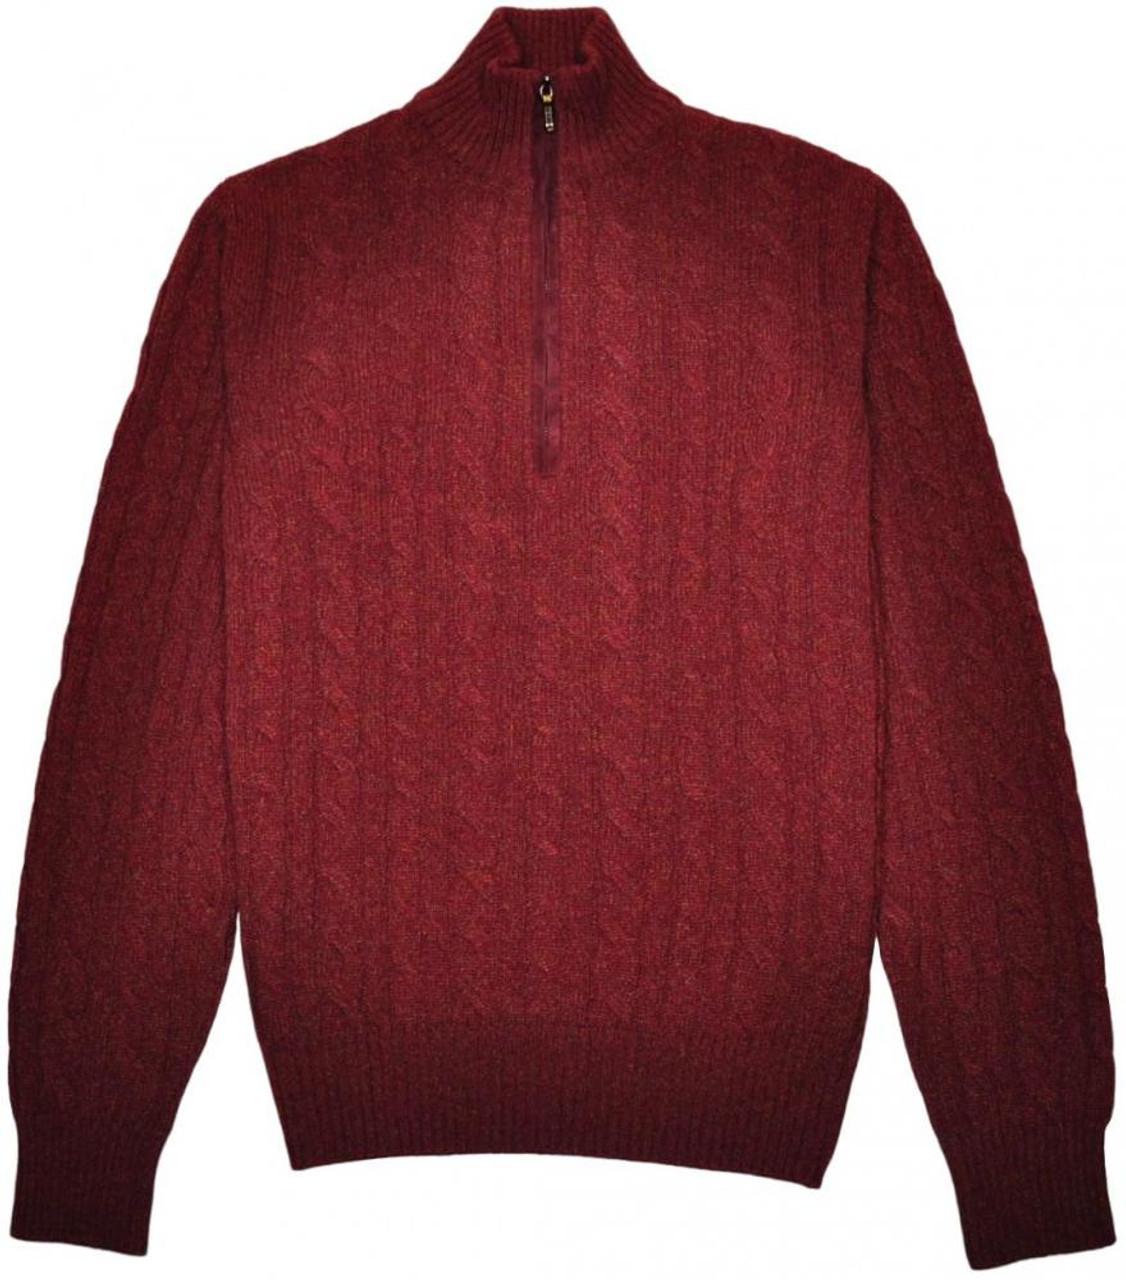 36b15d358ddf Loro Piana 1 2 Zip Sweater Baby Cashmere 48 Small Burgundy